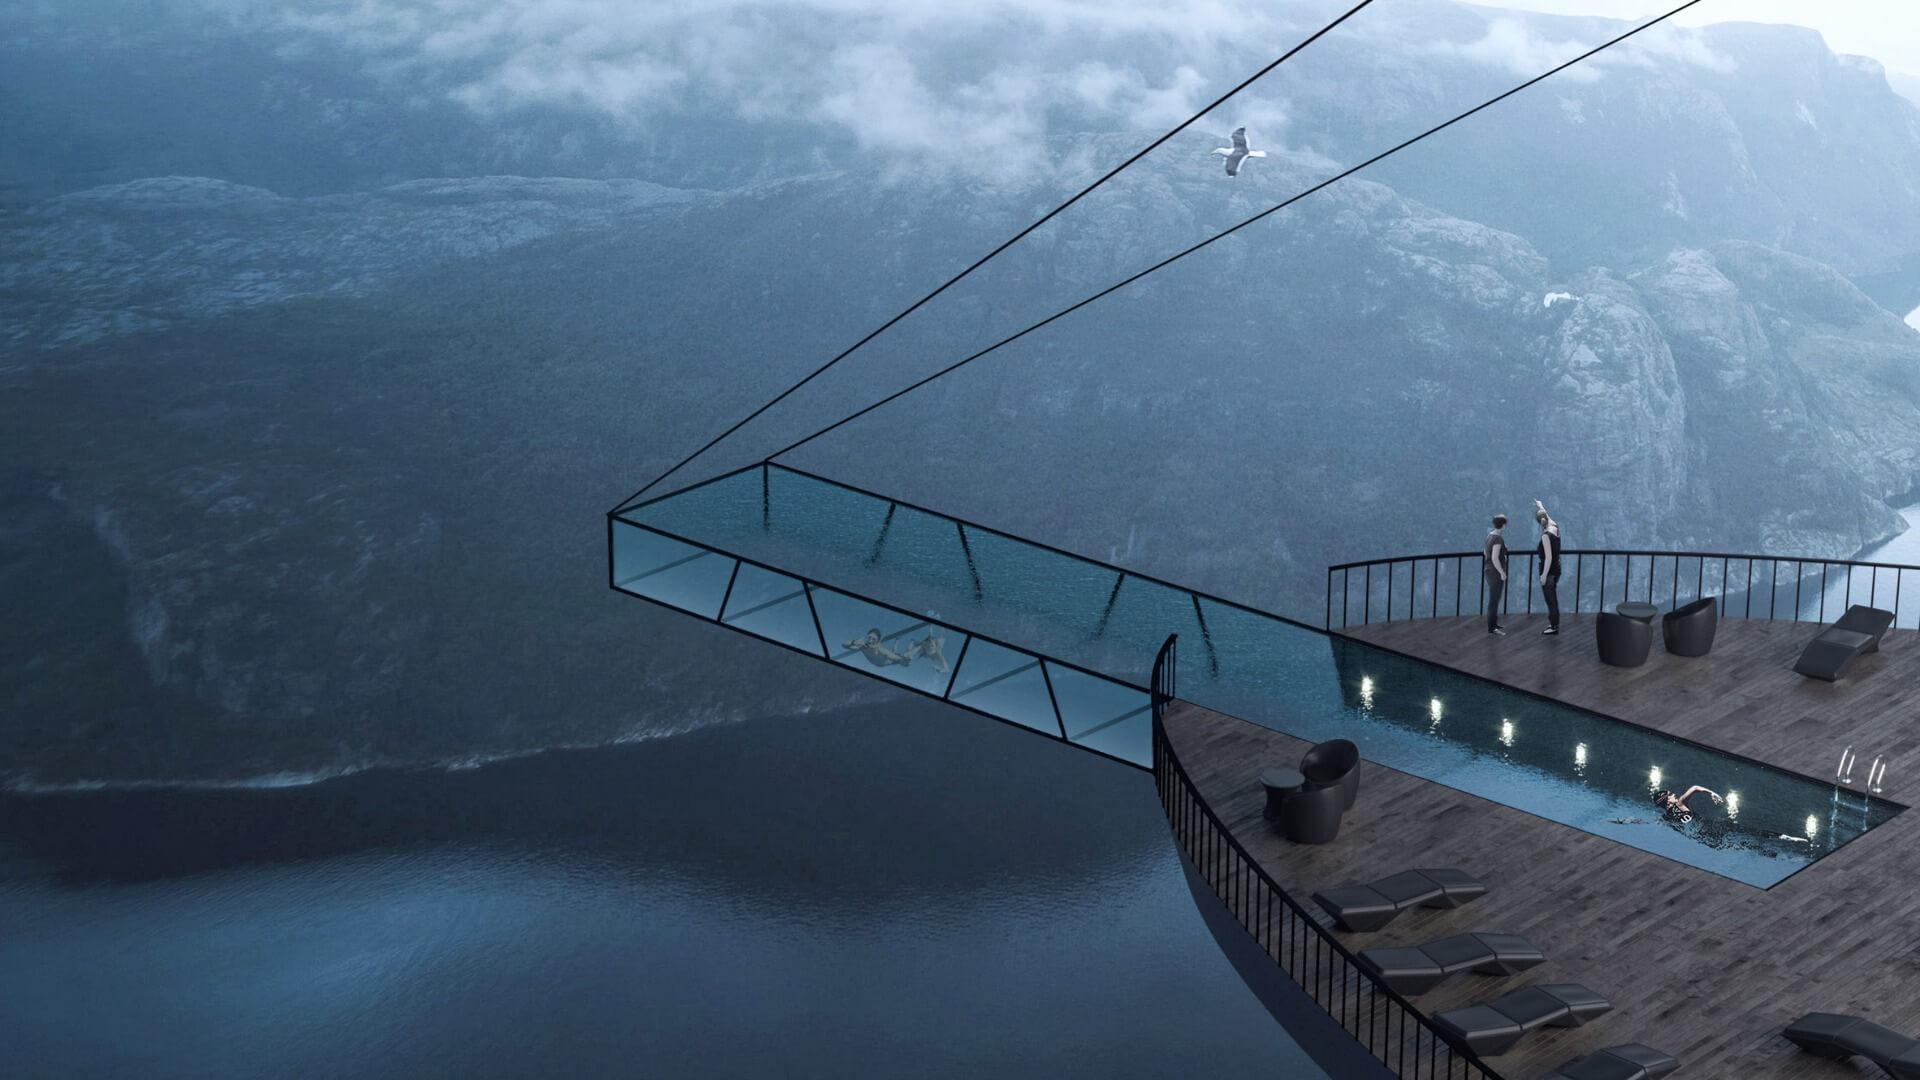 cliff-concept-boutique-hotel-by-hayri-atak-architectural-design-studio-norway-conceptual-architecture_dezeen_2364_col_0